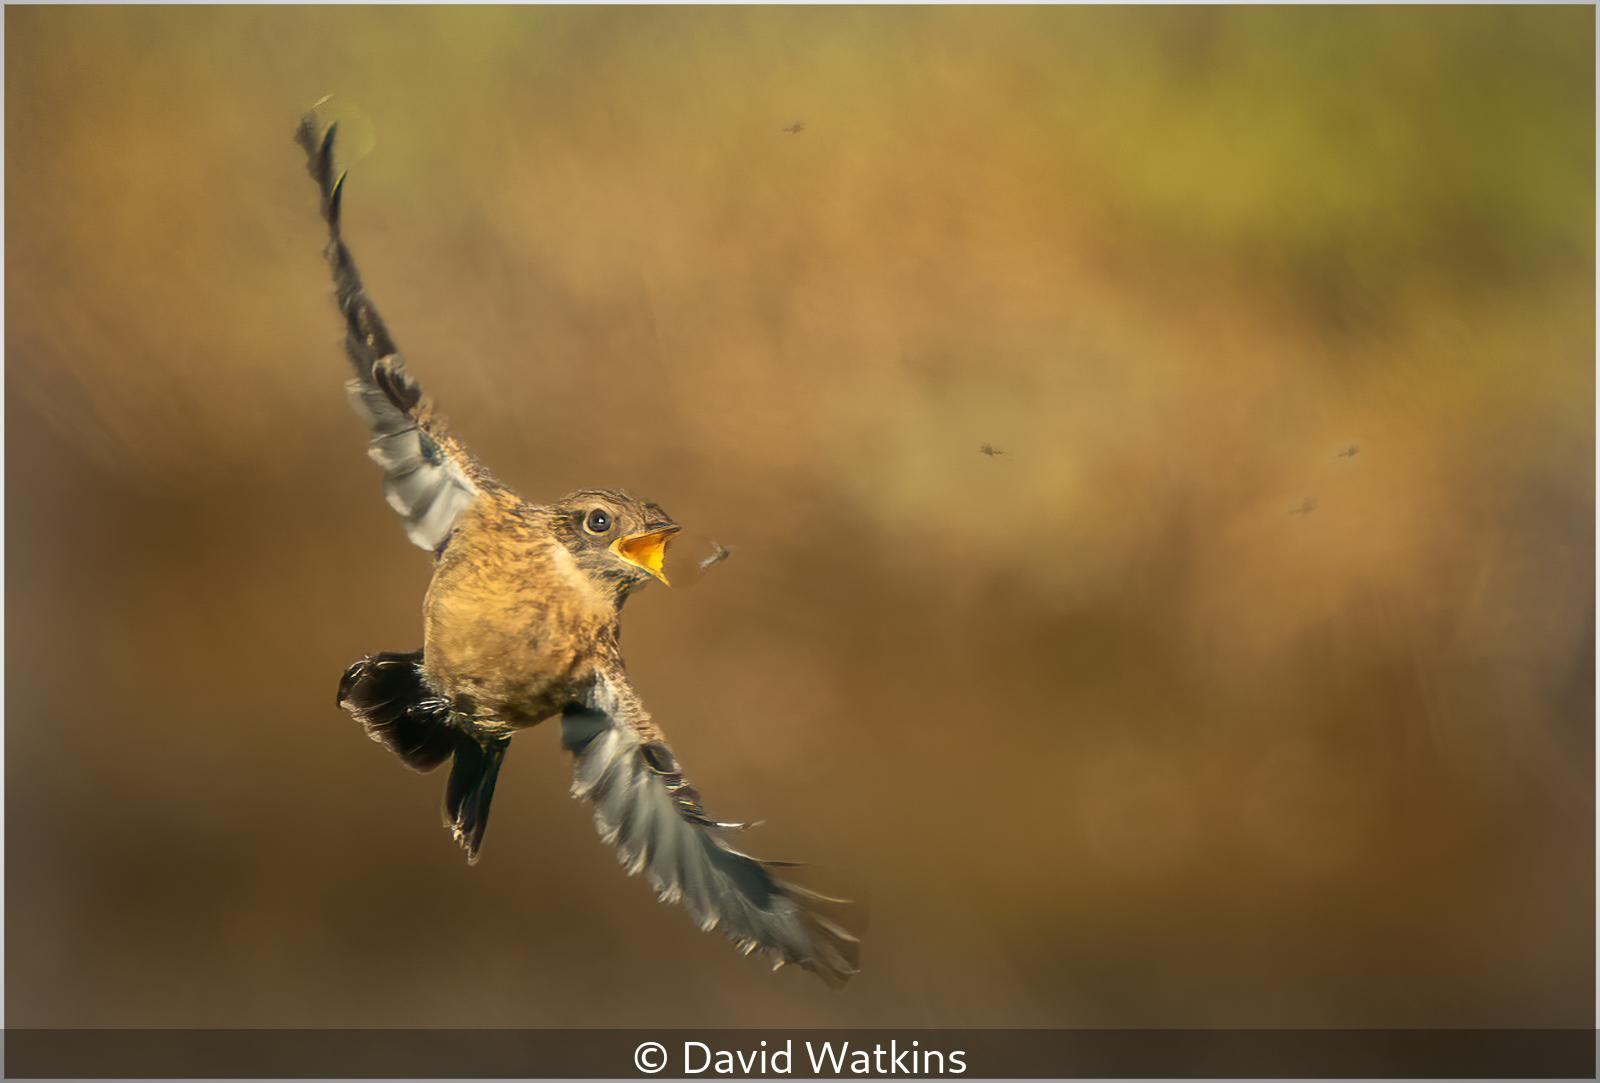 David Watkins - Catching Flies